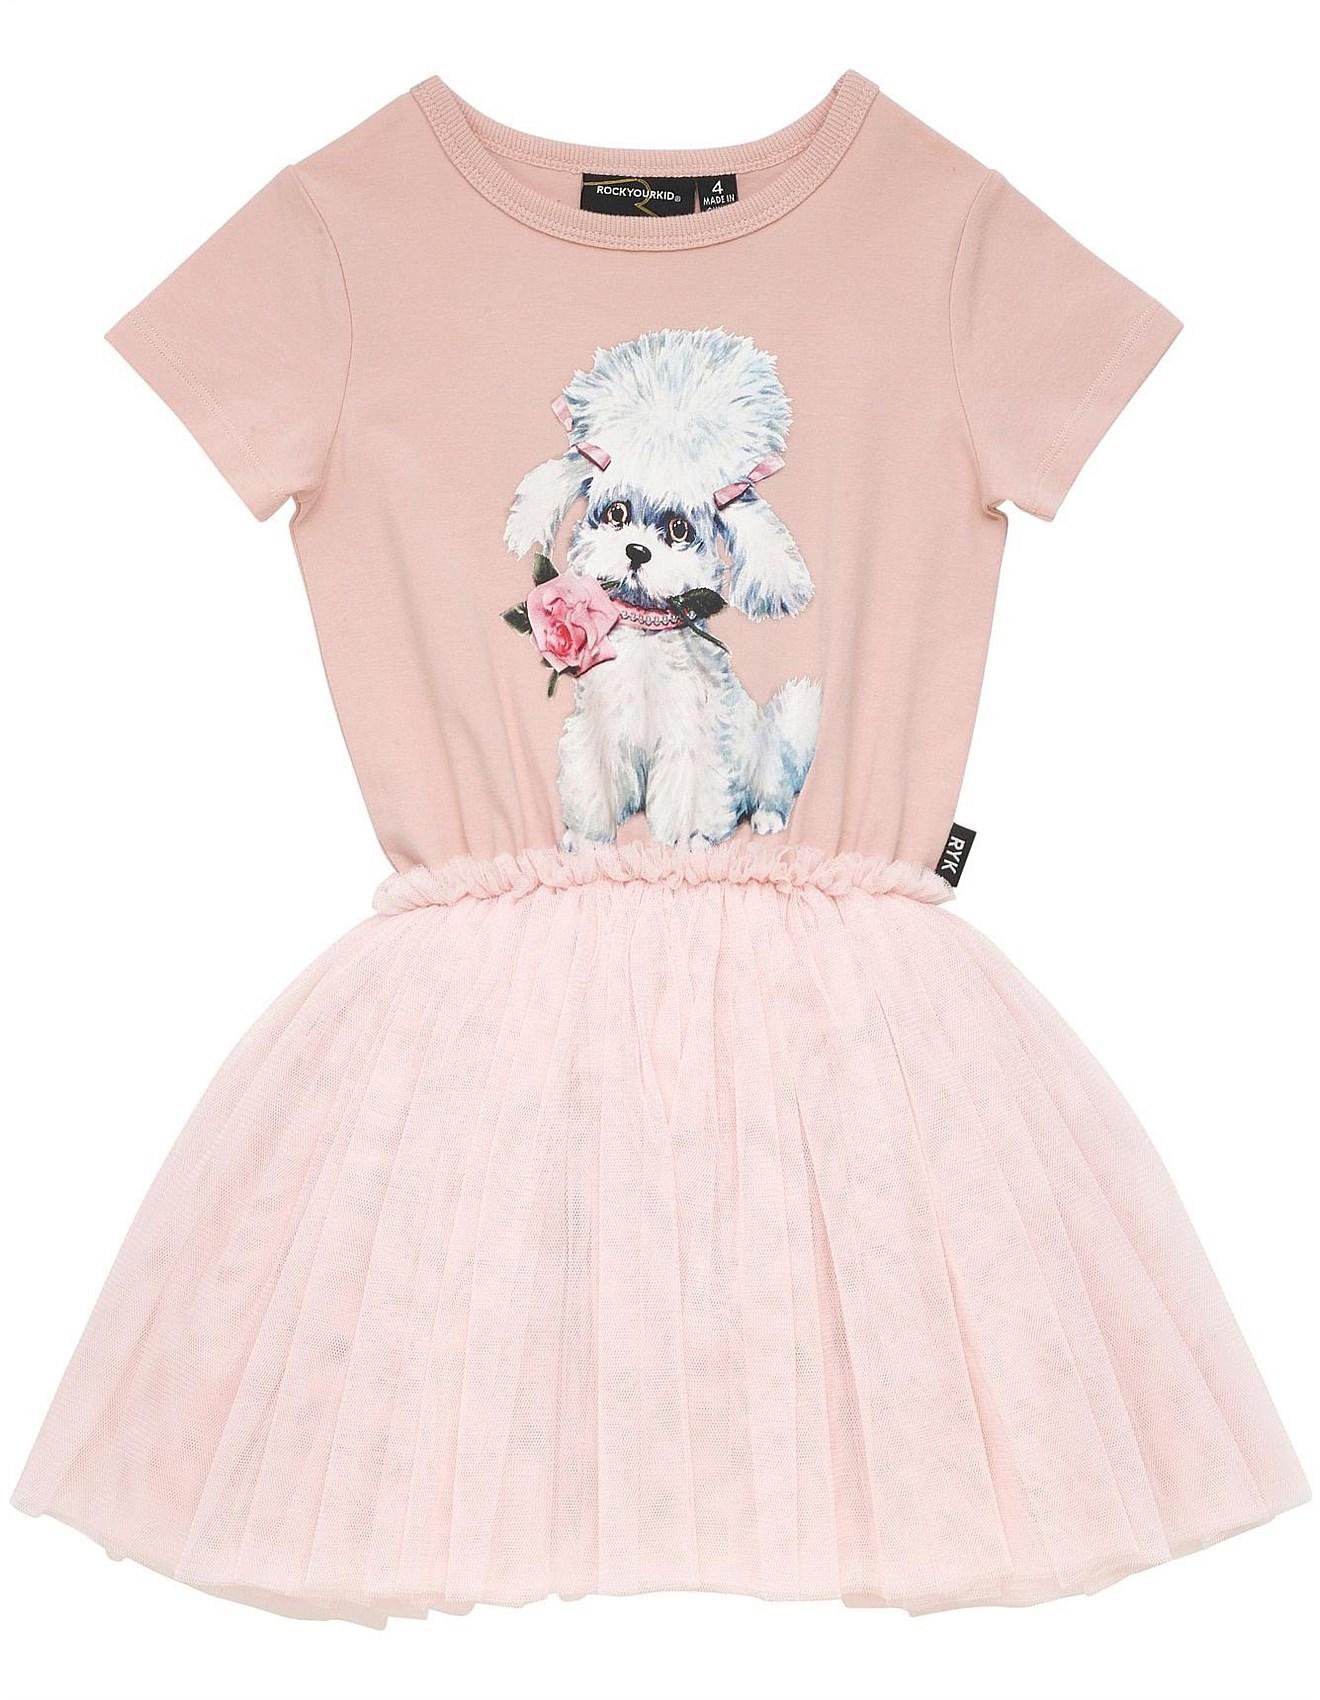 3f36bdecd Kids Clothing Sale